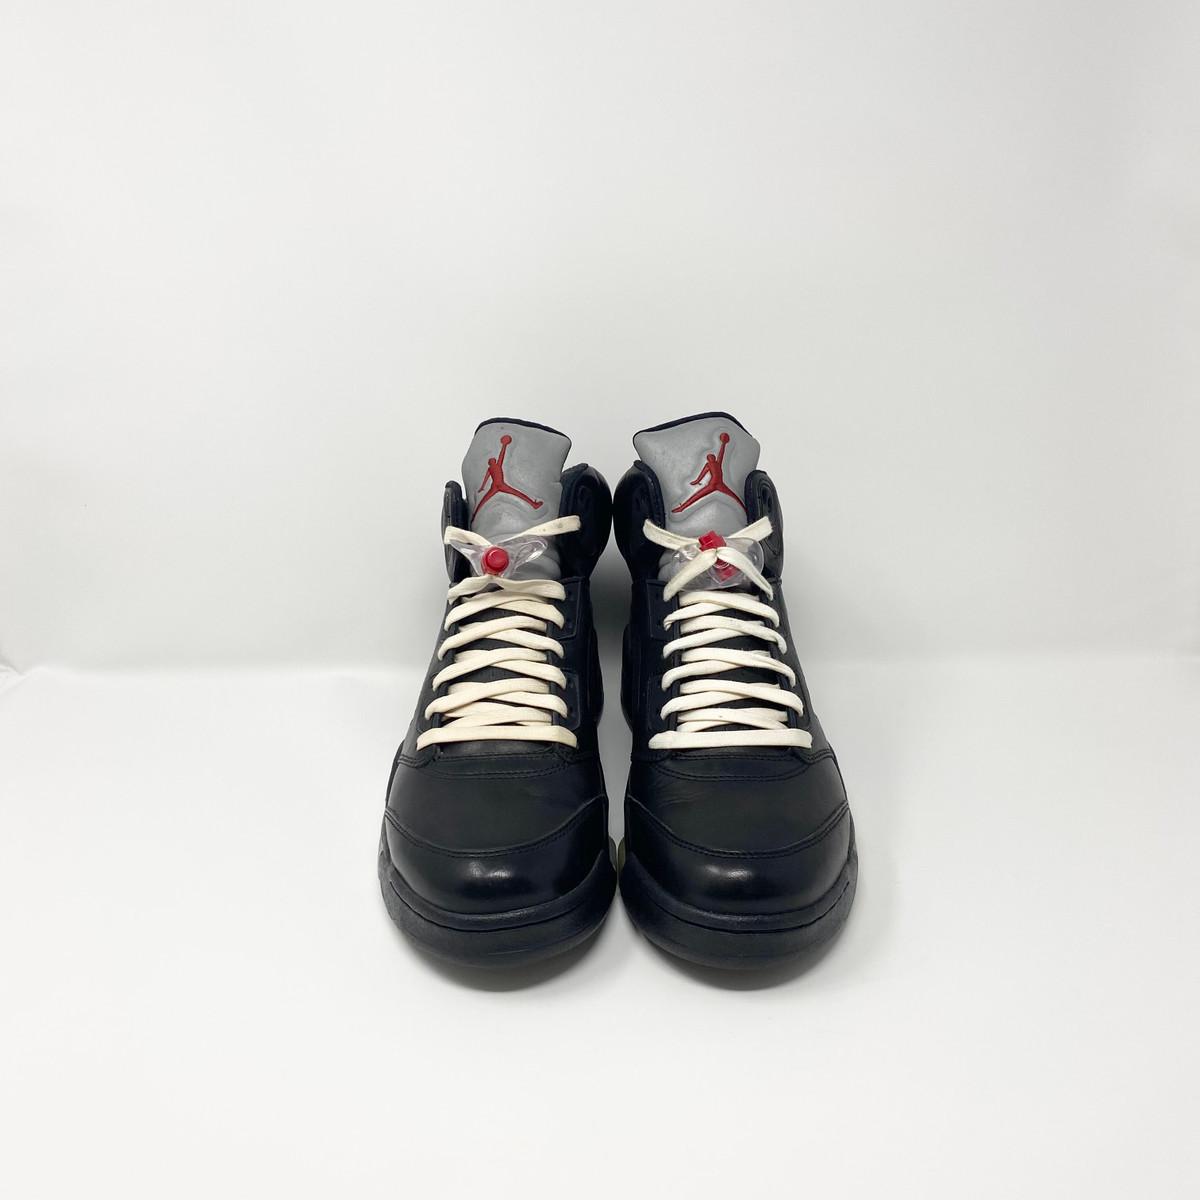 Air Jordan 5 Premio Bin23